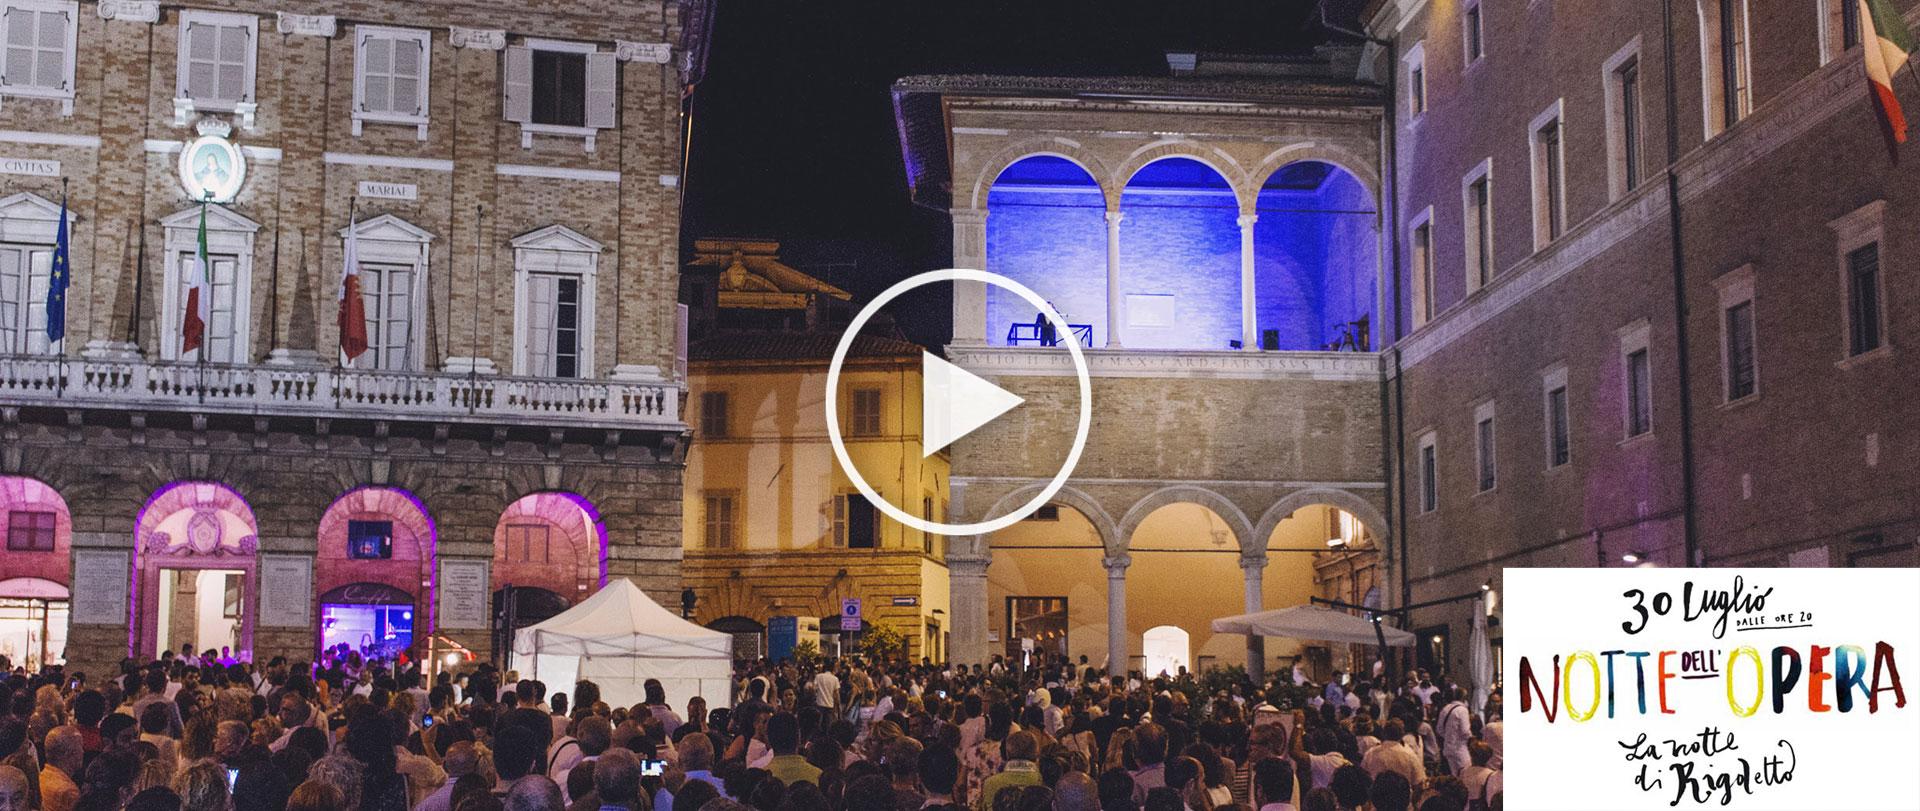 #portfolio #video #opera #seristerio #nottedellopera #nutrirelanima